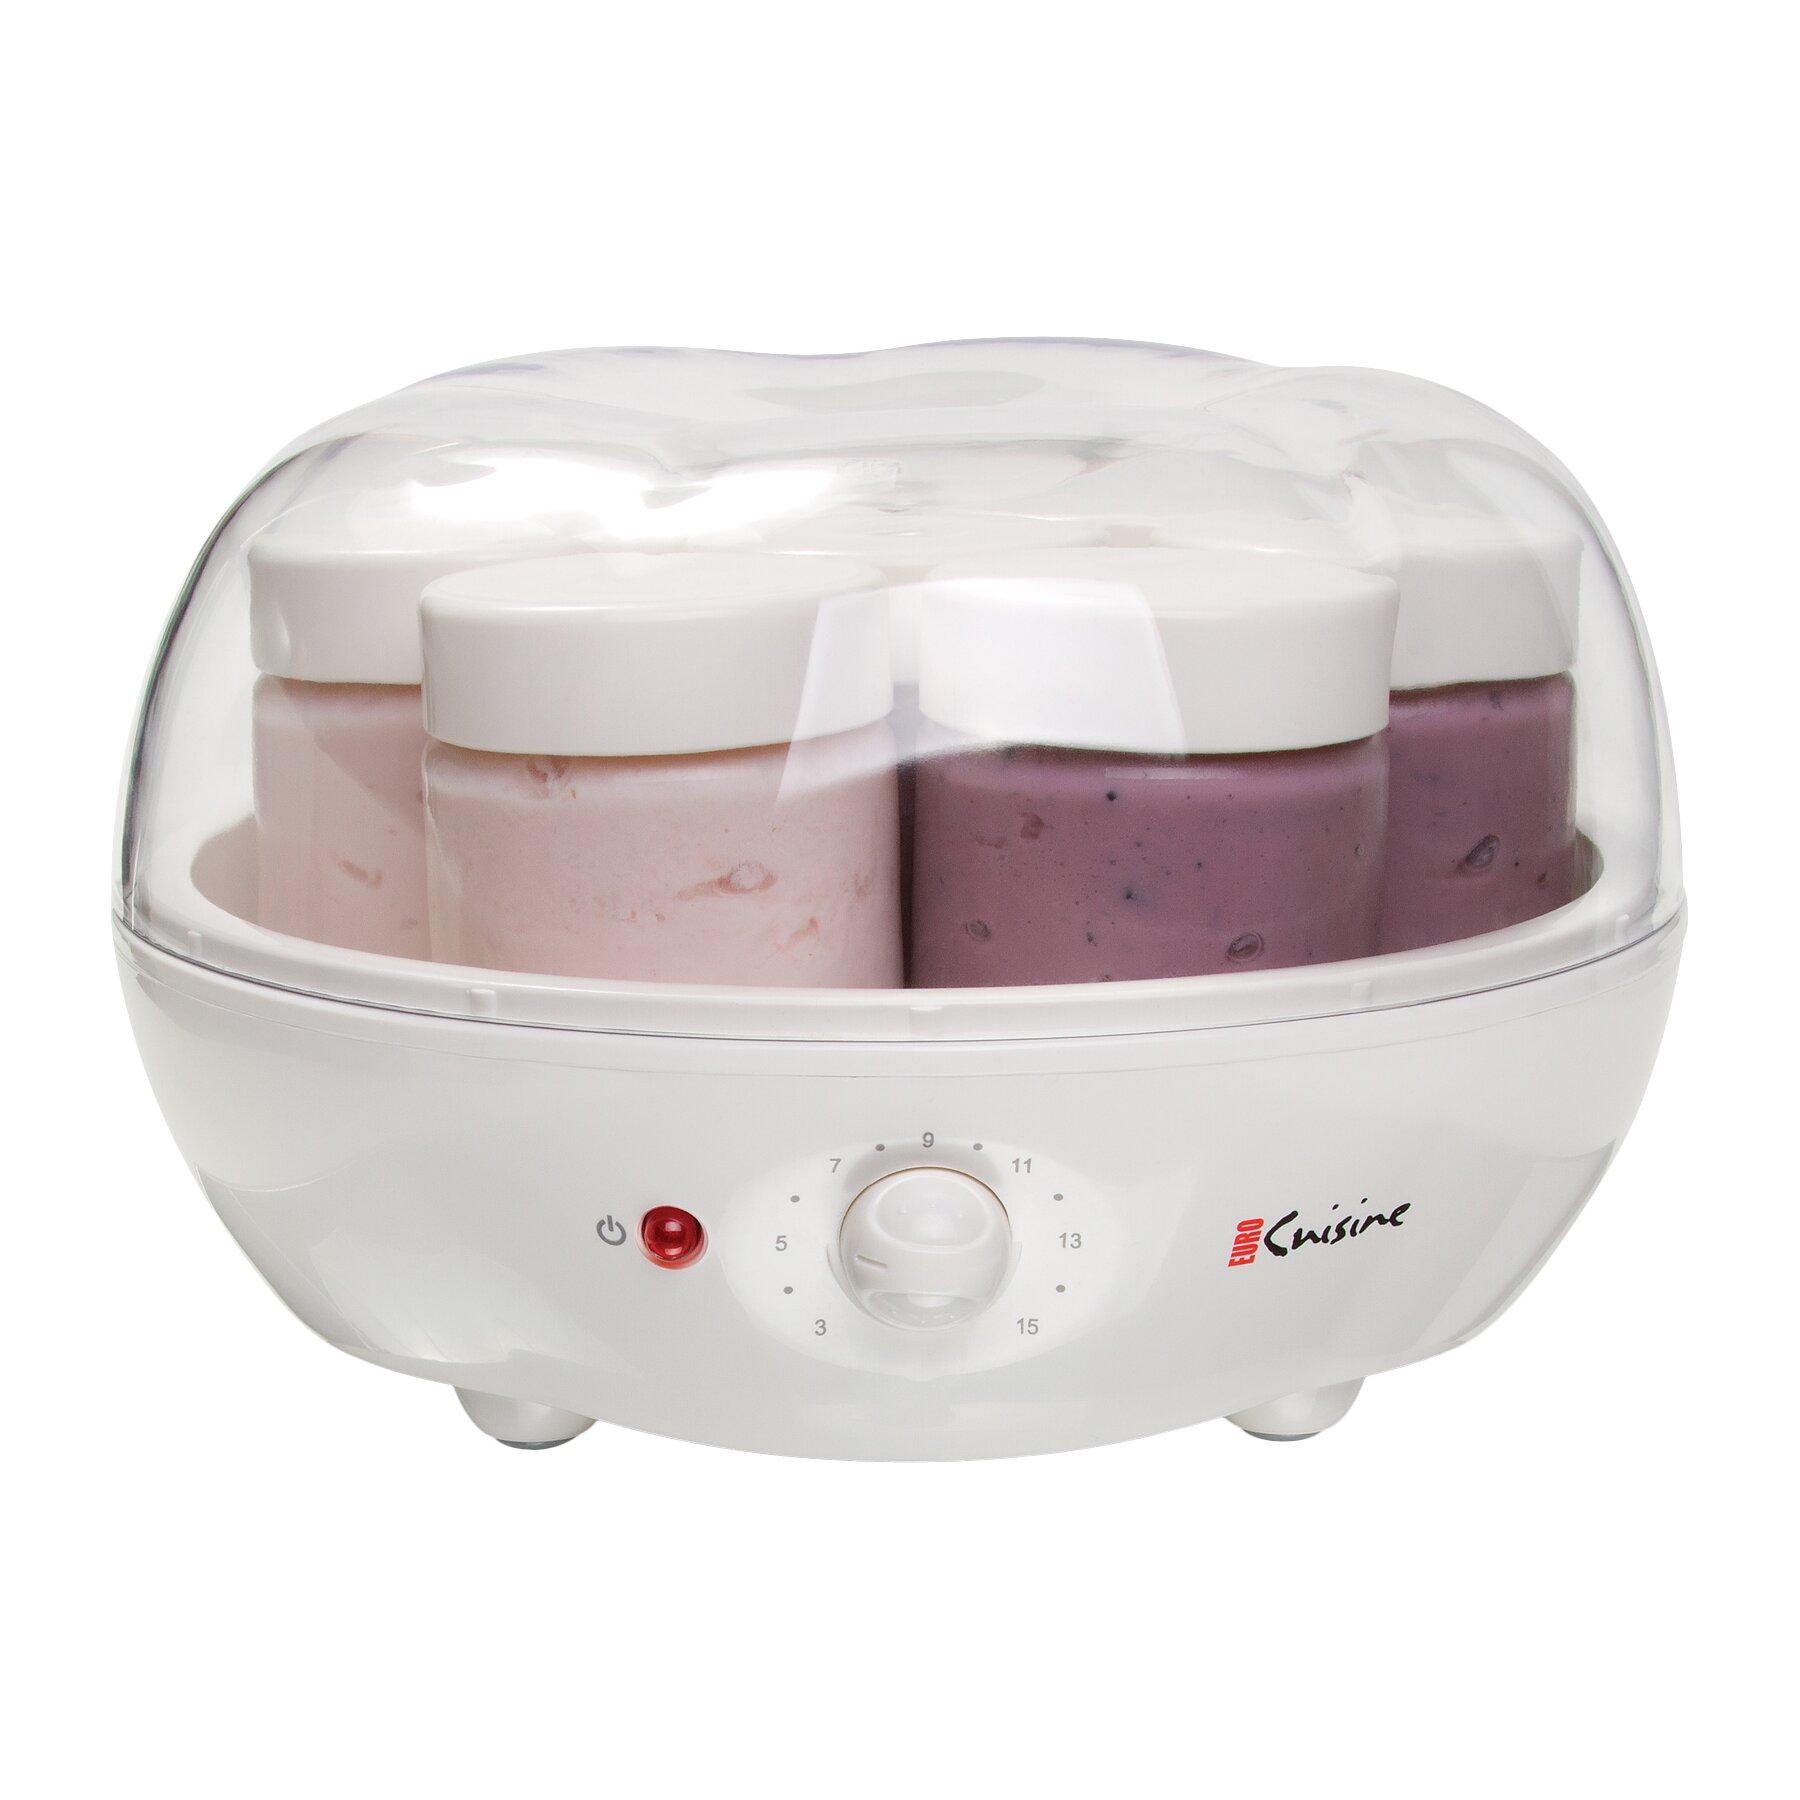 Euro cuisine automatic yogurt maker reviews wayfair for Cuisine yogurt maker recipe